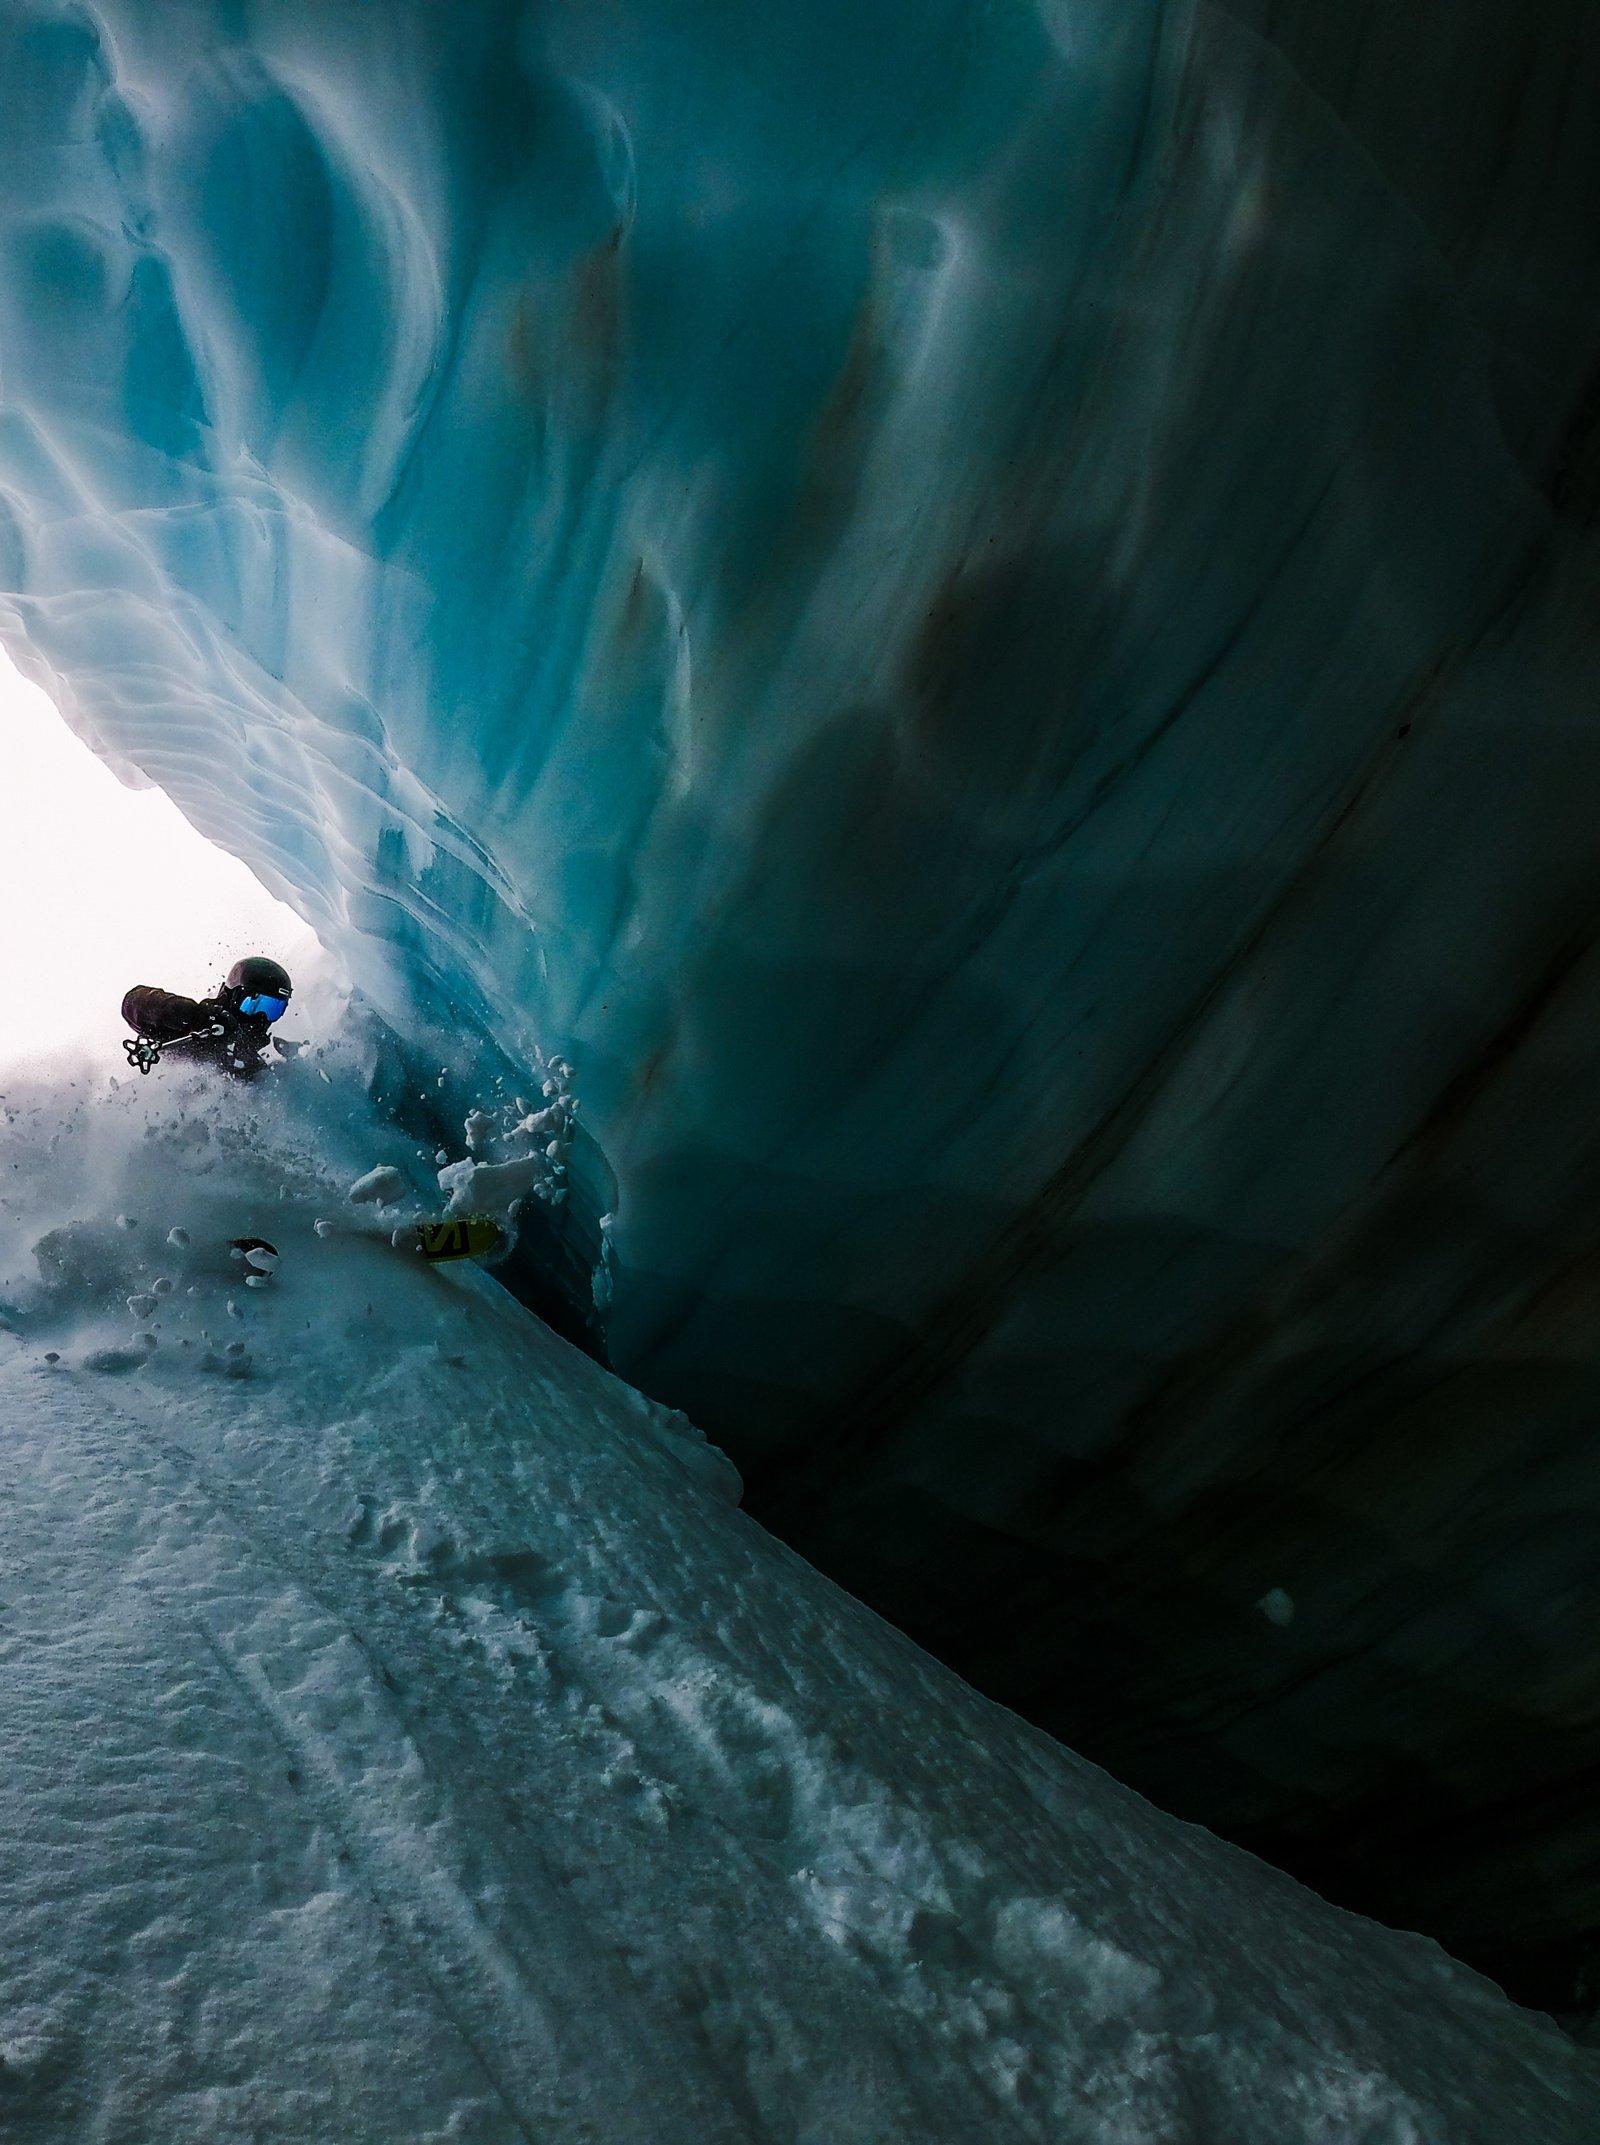 Ice Cave Descent